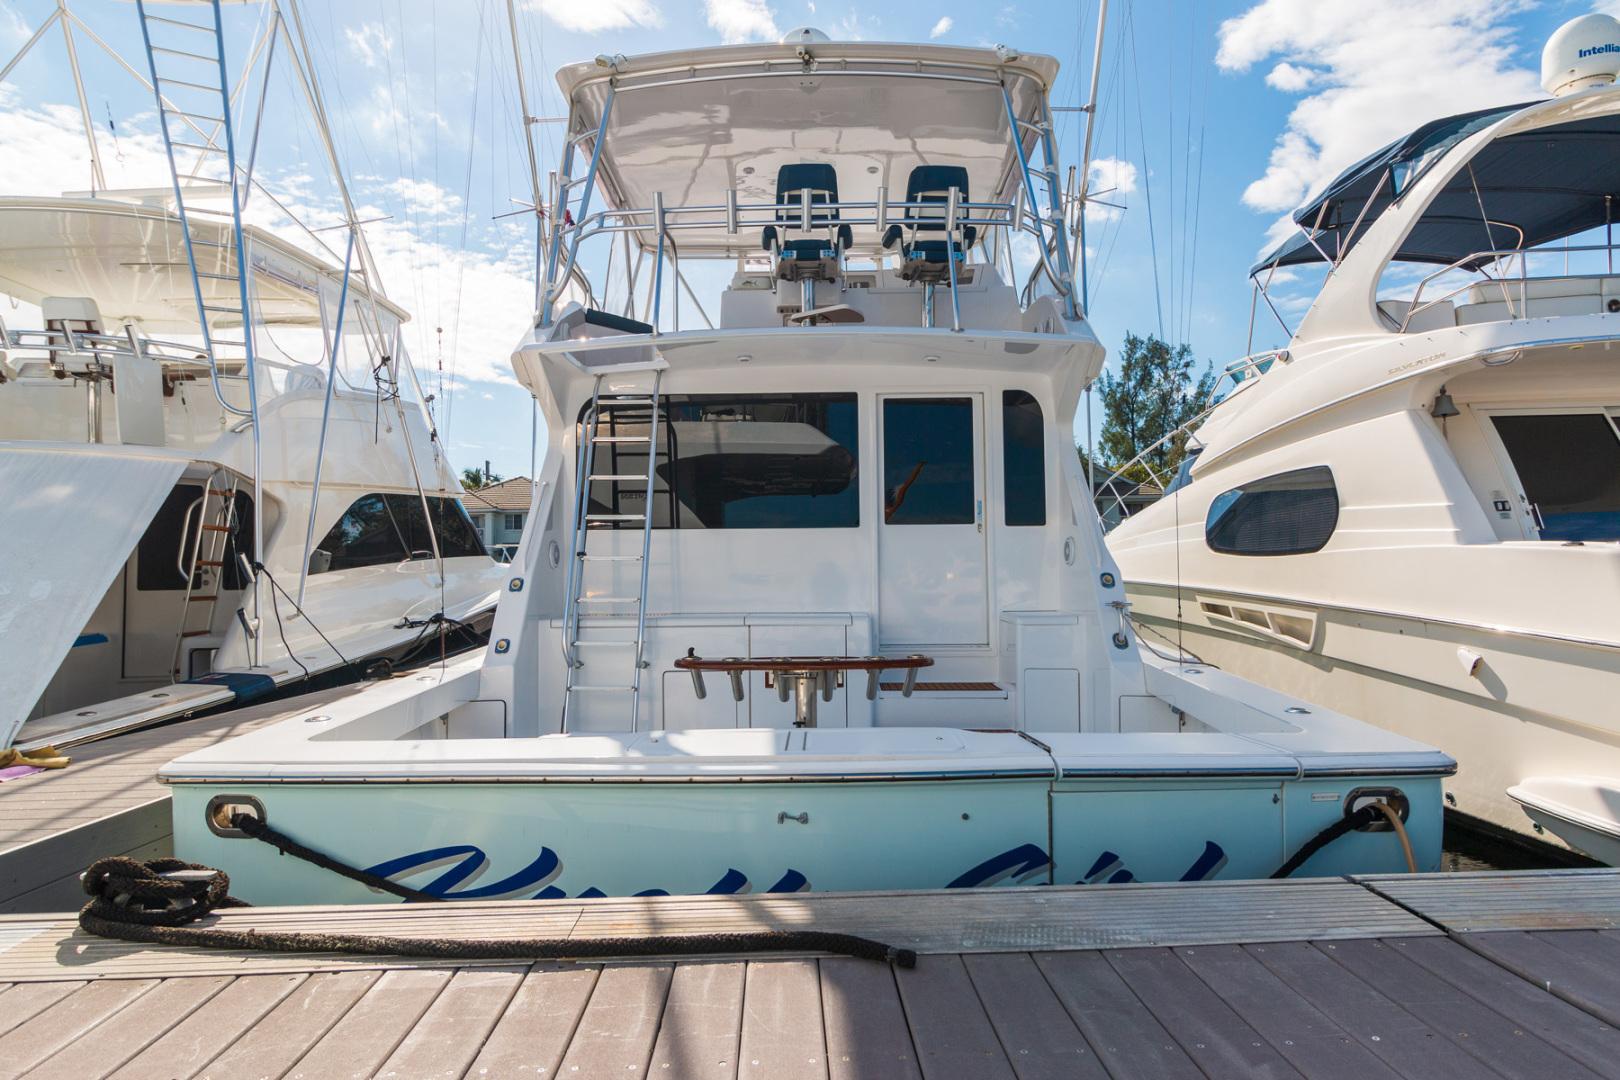 Viking-Convertible 2000-Knotty Girl Fort Lauderdale-Florida-United States-1564770   Thumbnail